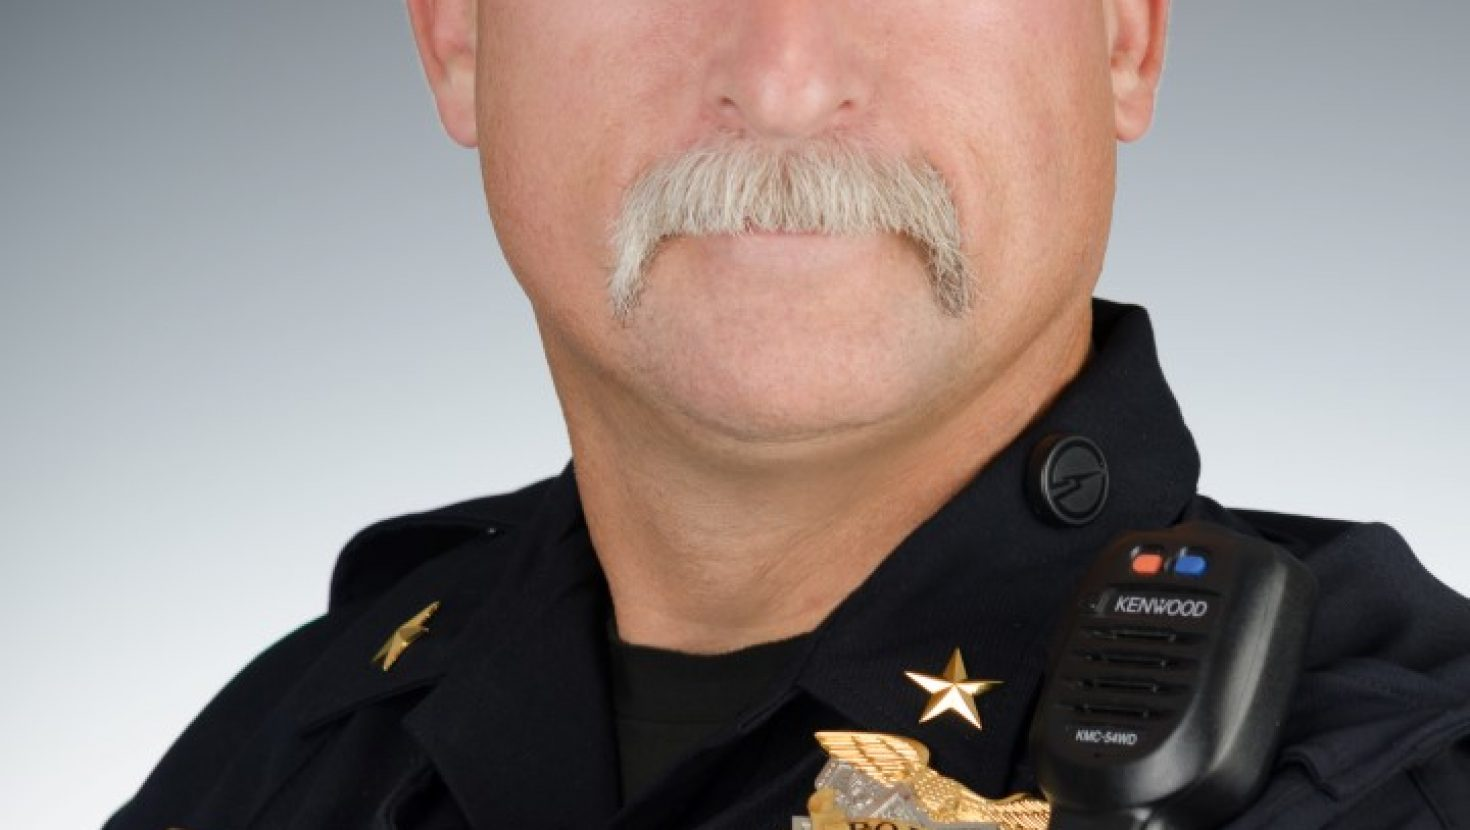 Help us celebrate Chief Burdette's retirement